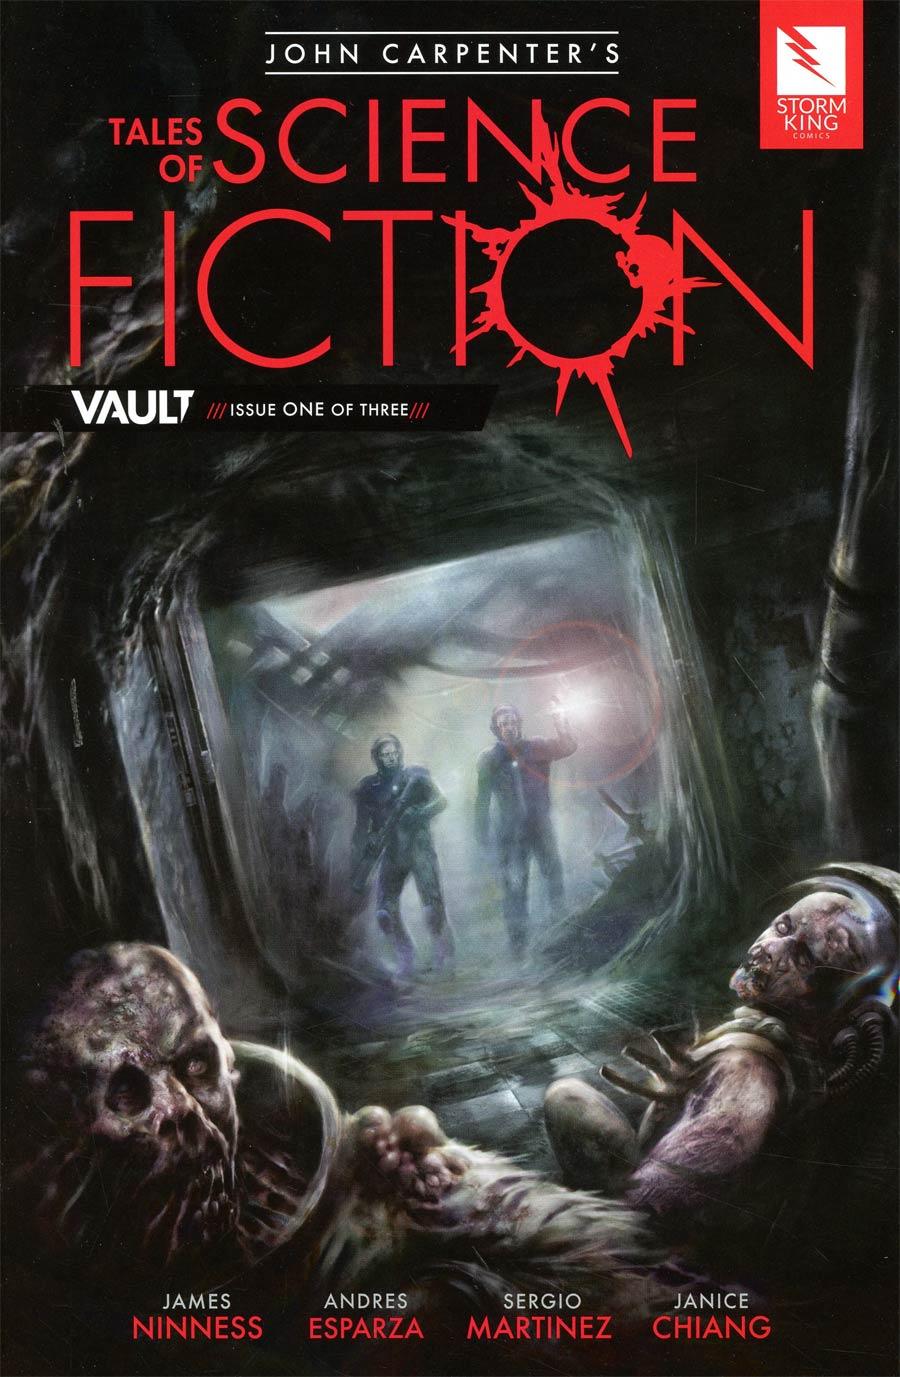 John Carpenters Tales Of Science Fiction Vault #1